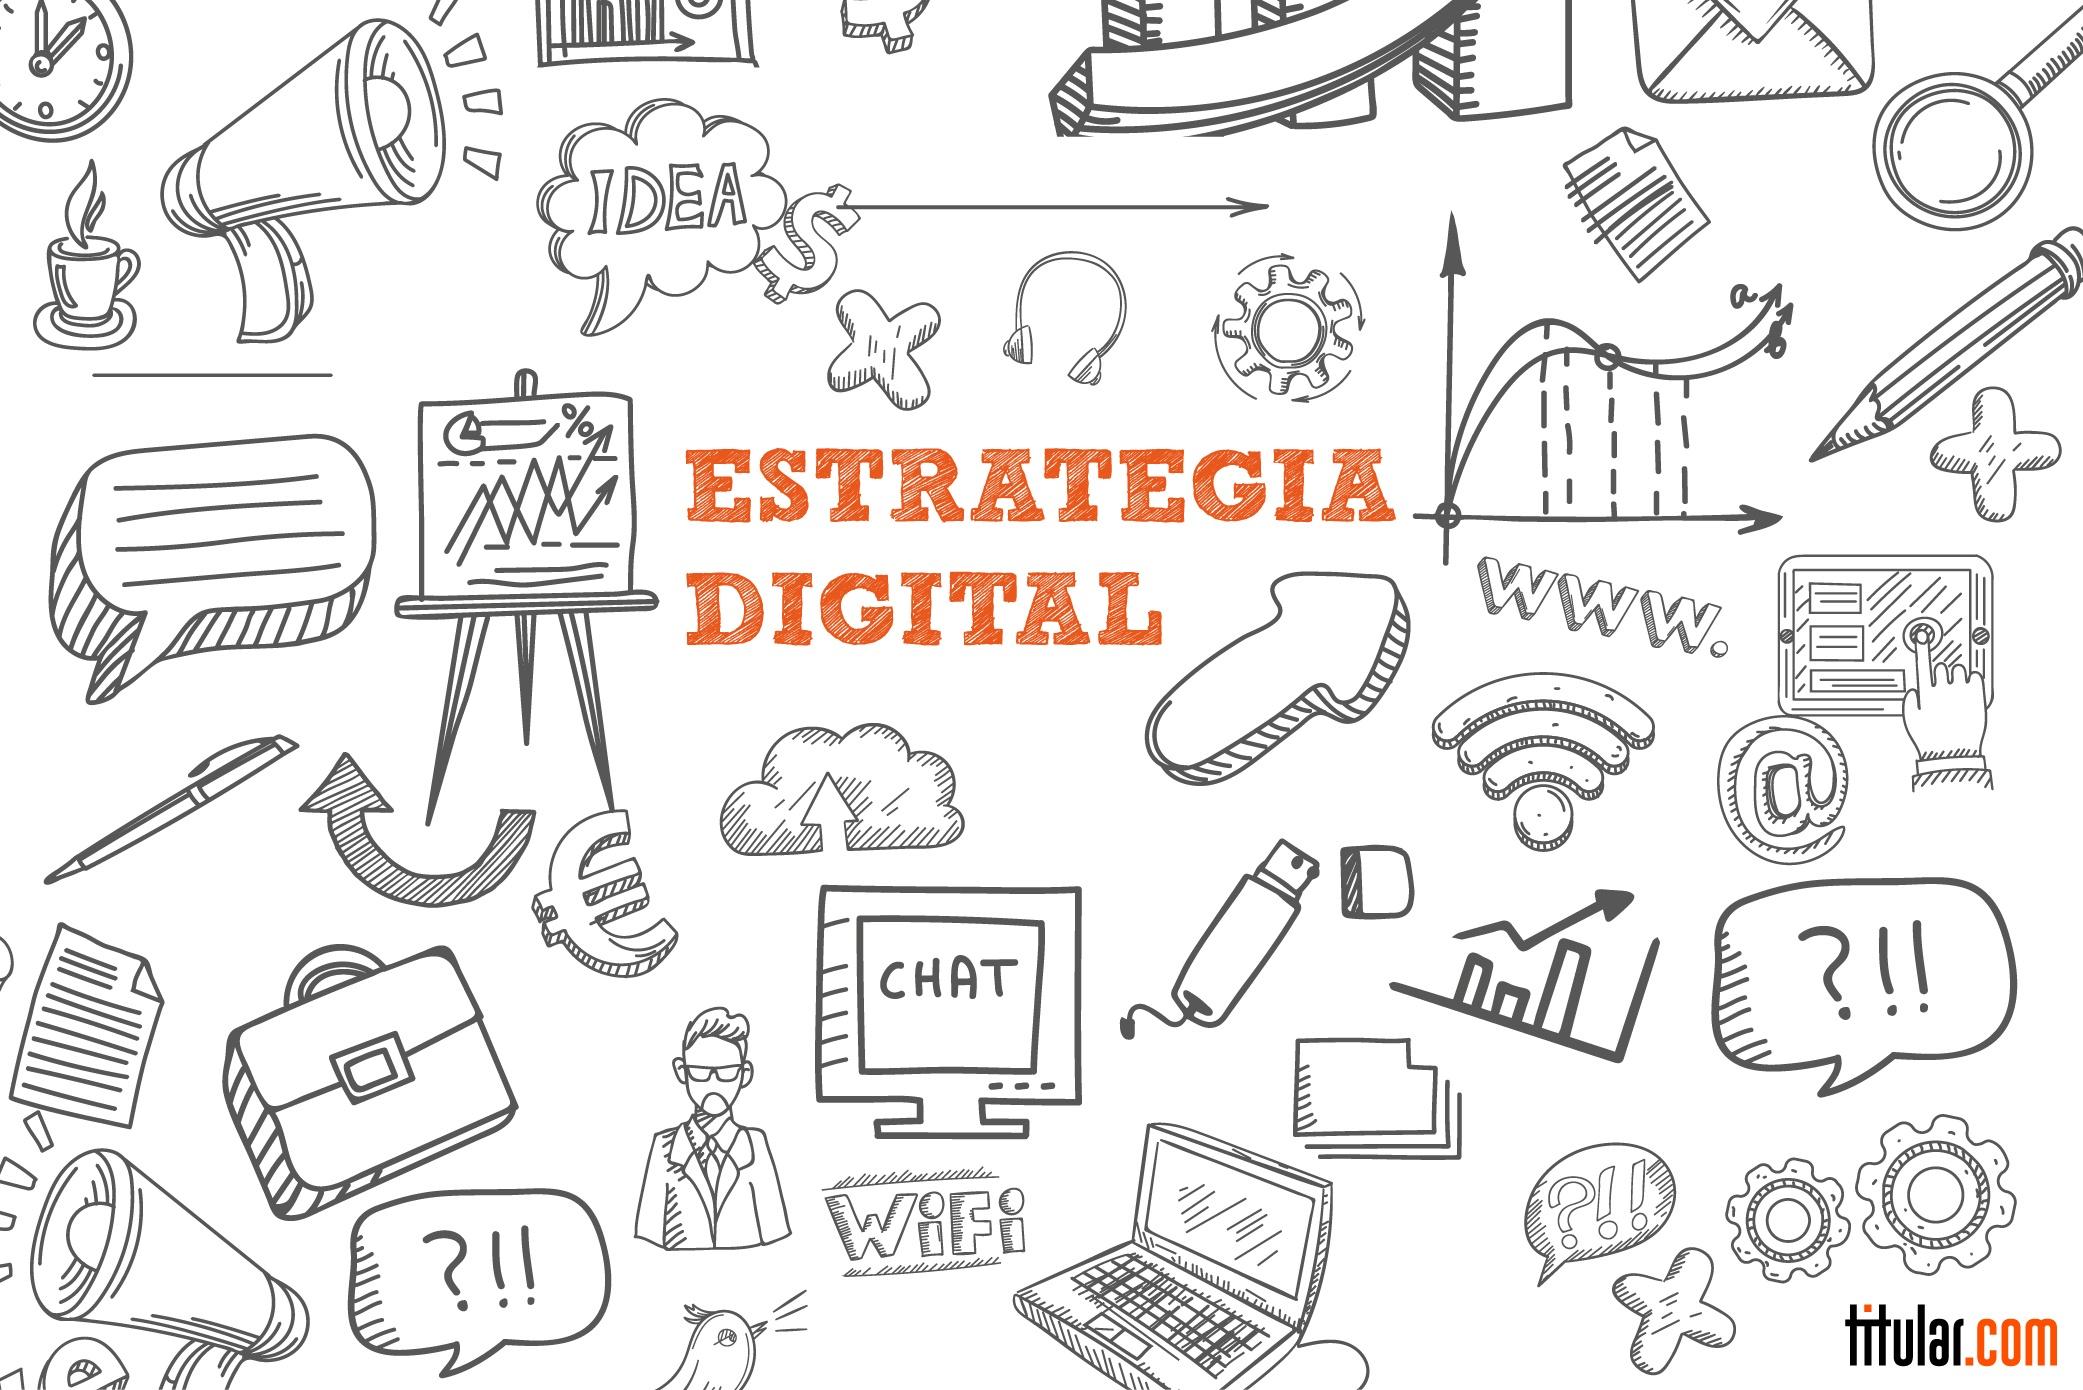 estrategia digital de marketing